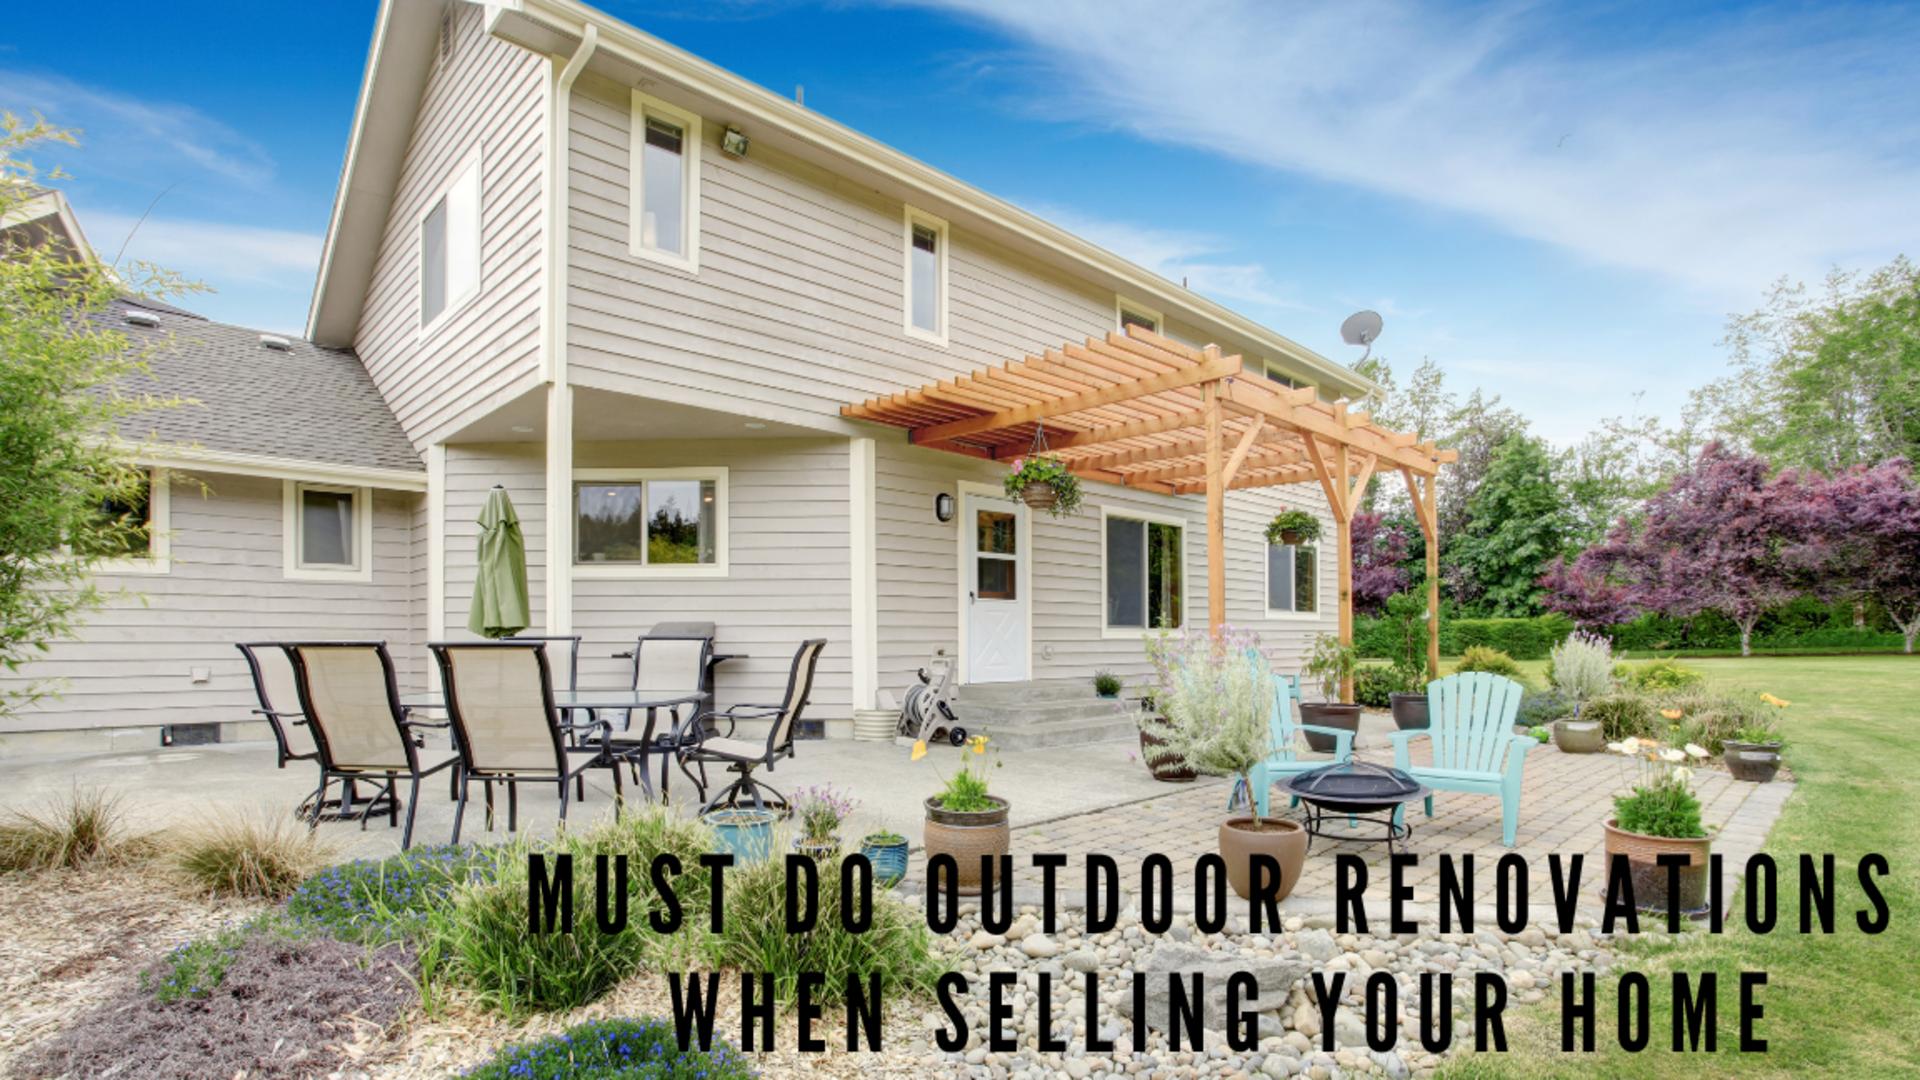 2018 Hottest Outdoor Renovations